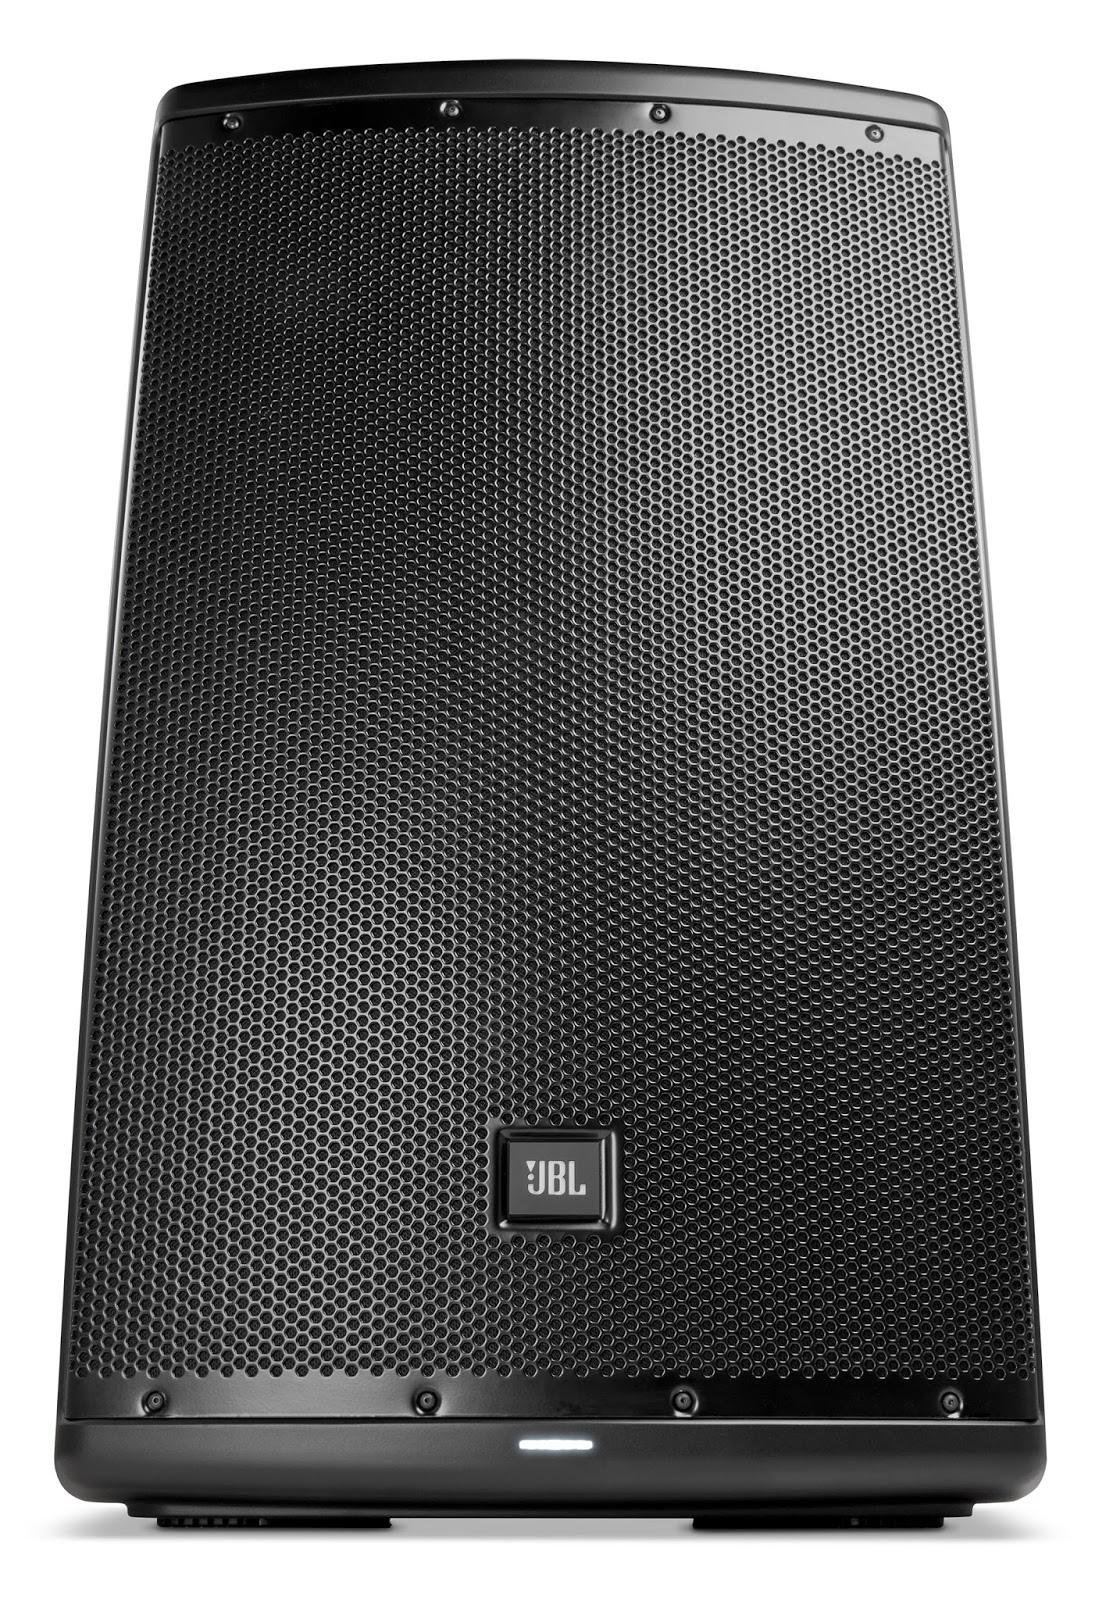 harman s jbl professional eon600 series brings studio. Black Bedroom Furniture Sets. Home Design Ideas